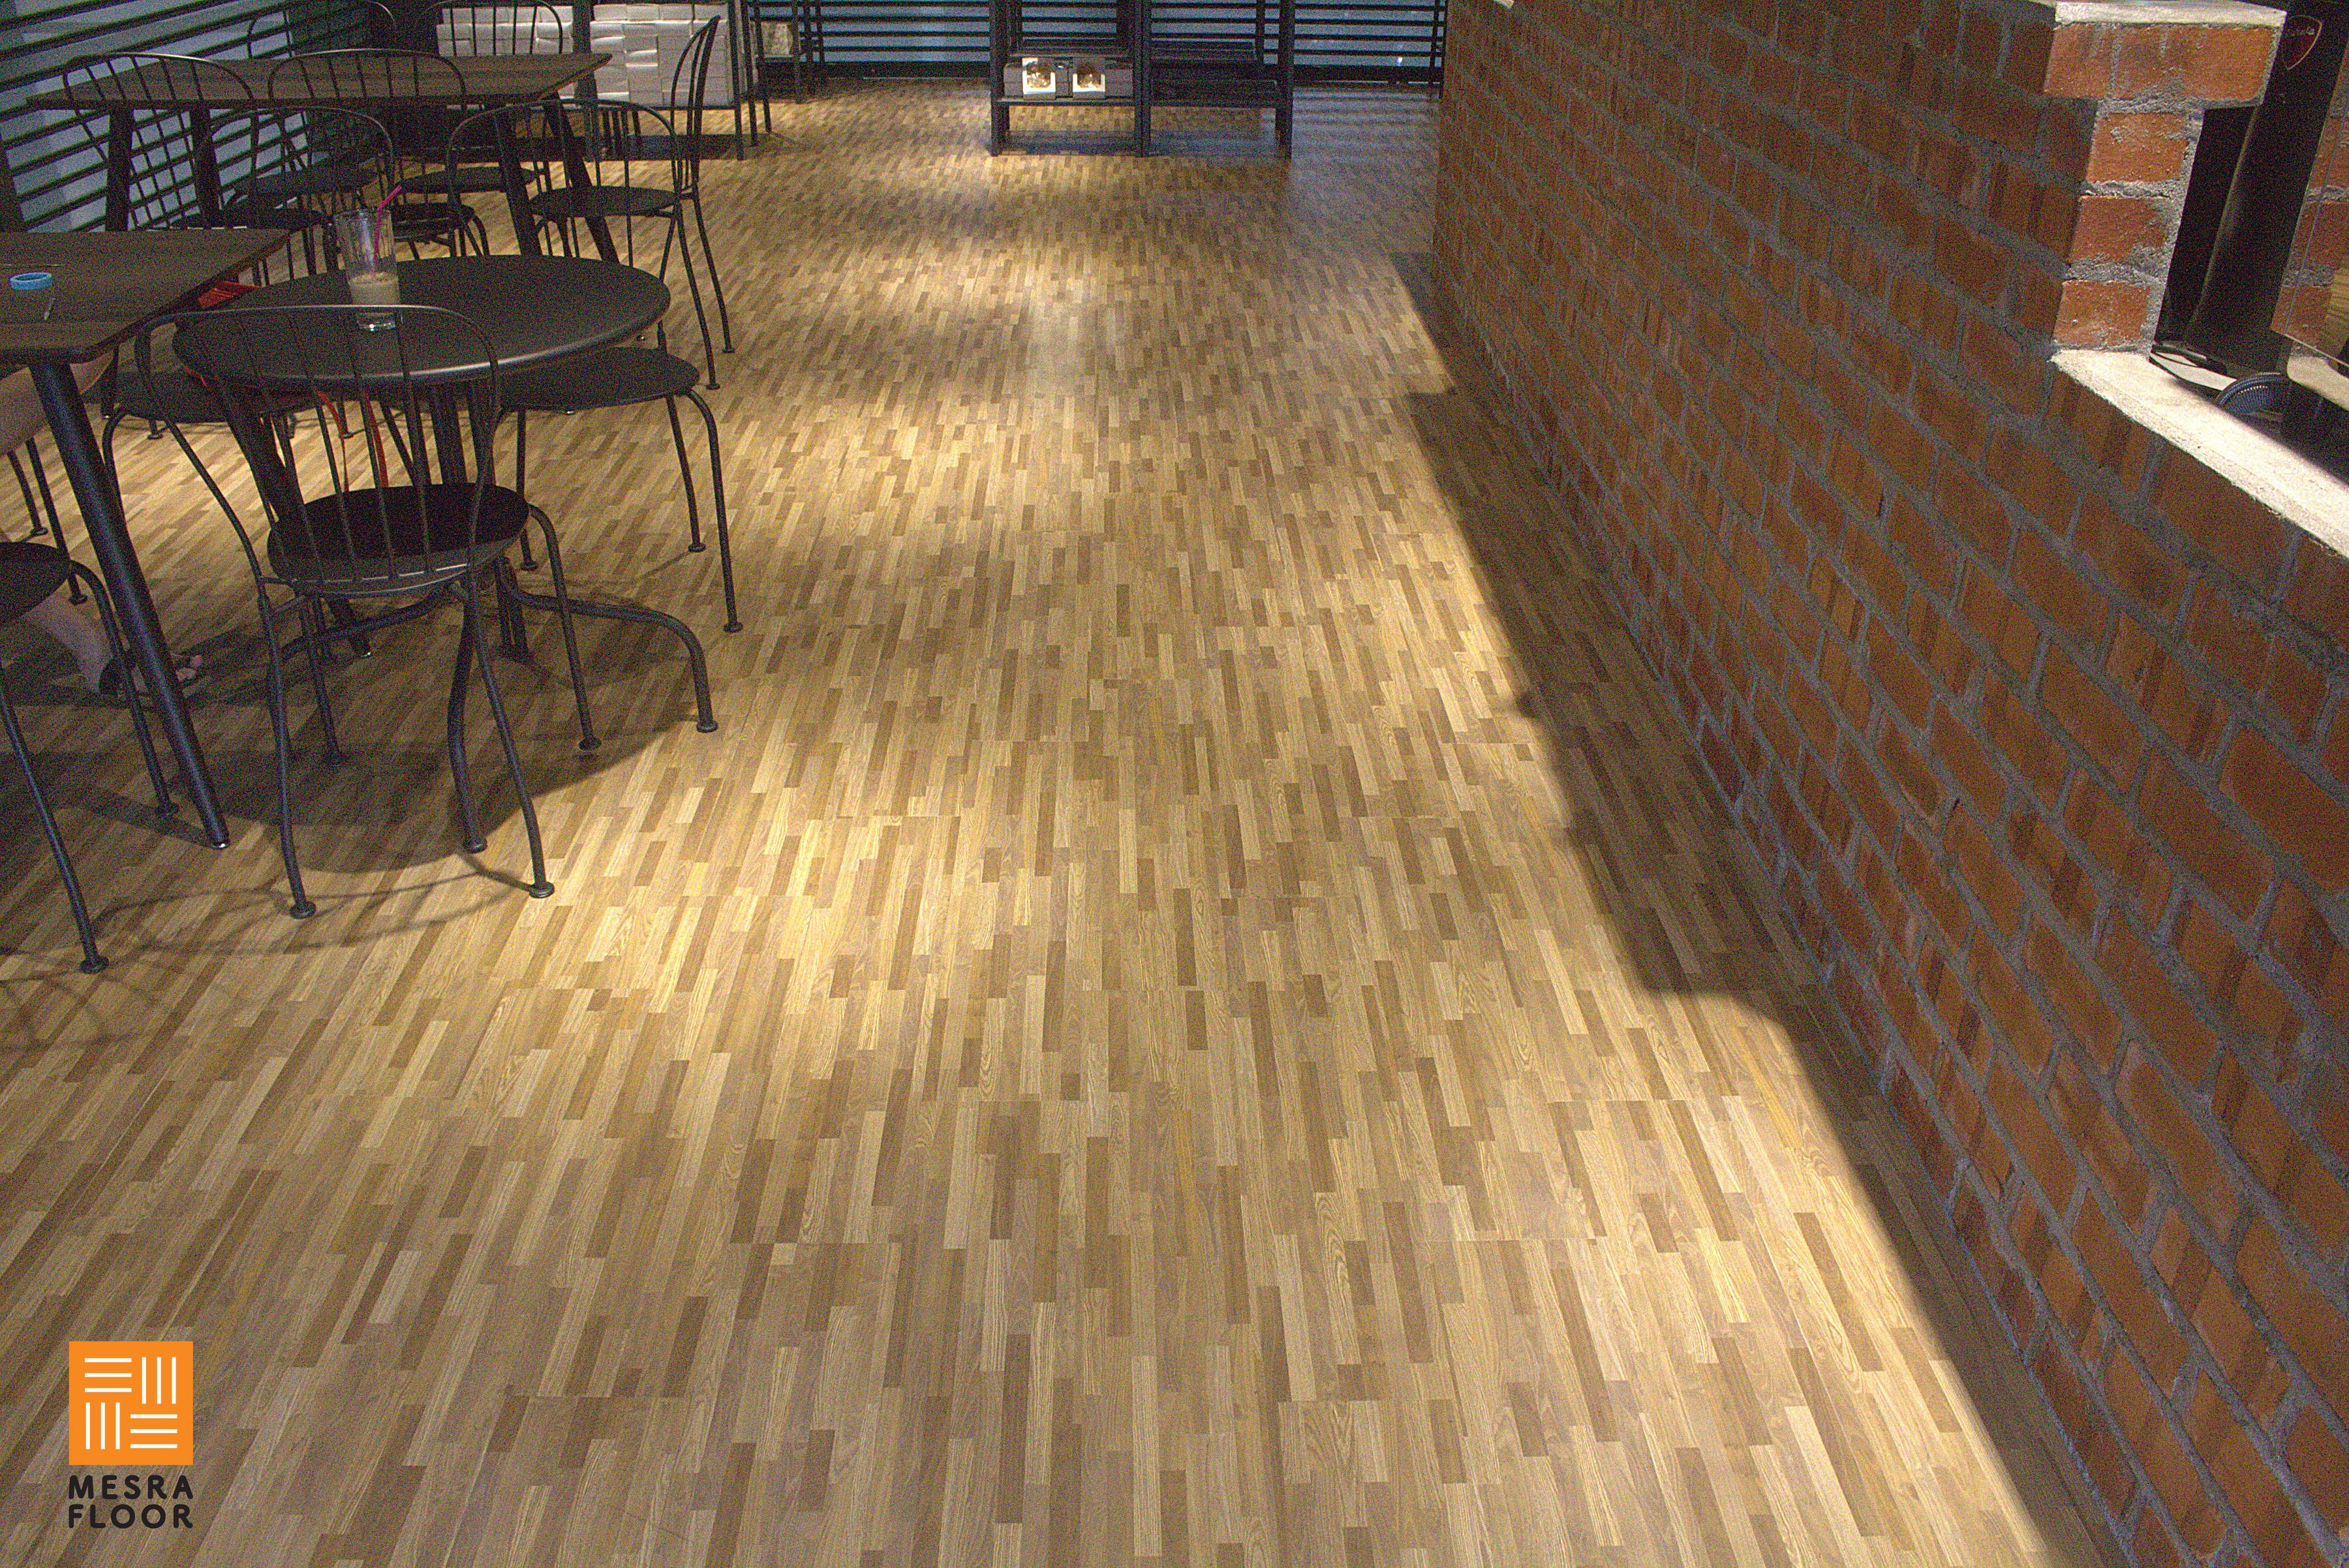 MesraFloor KBNK Vinyl Floors